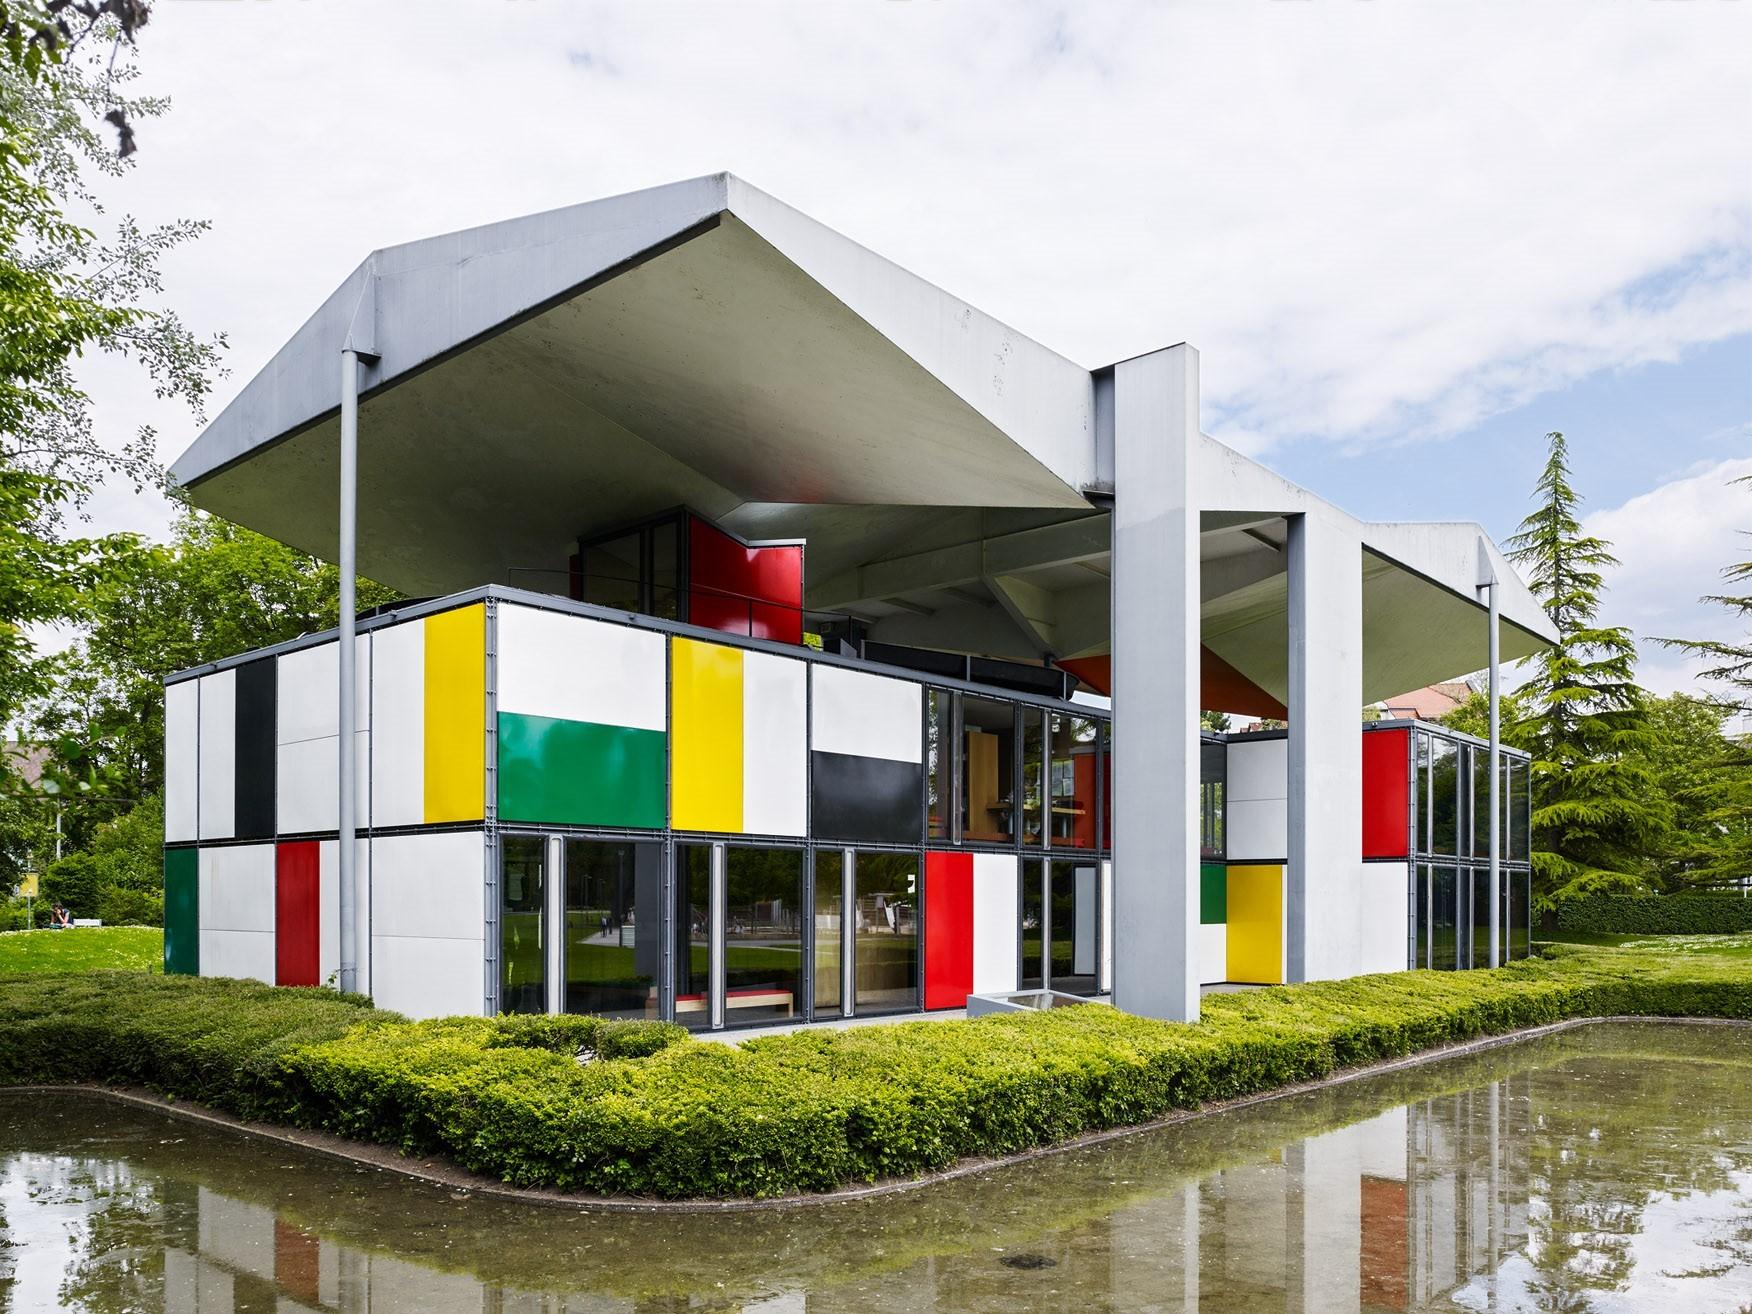 Pavillon le corbusier city of zurich - Pavillon residentiel moderne gurney architecte ...